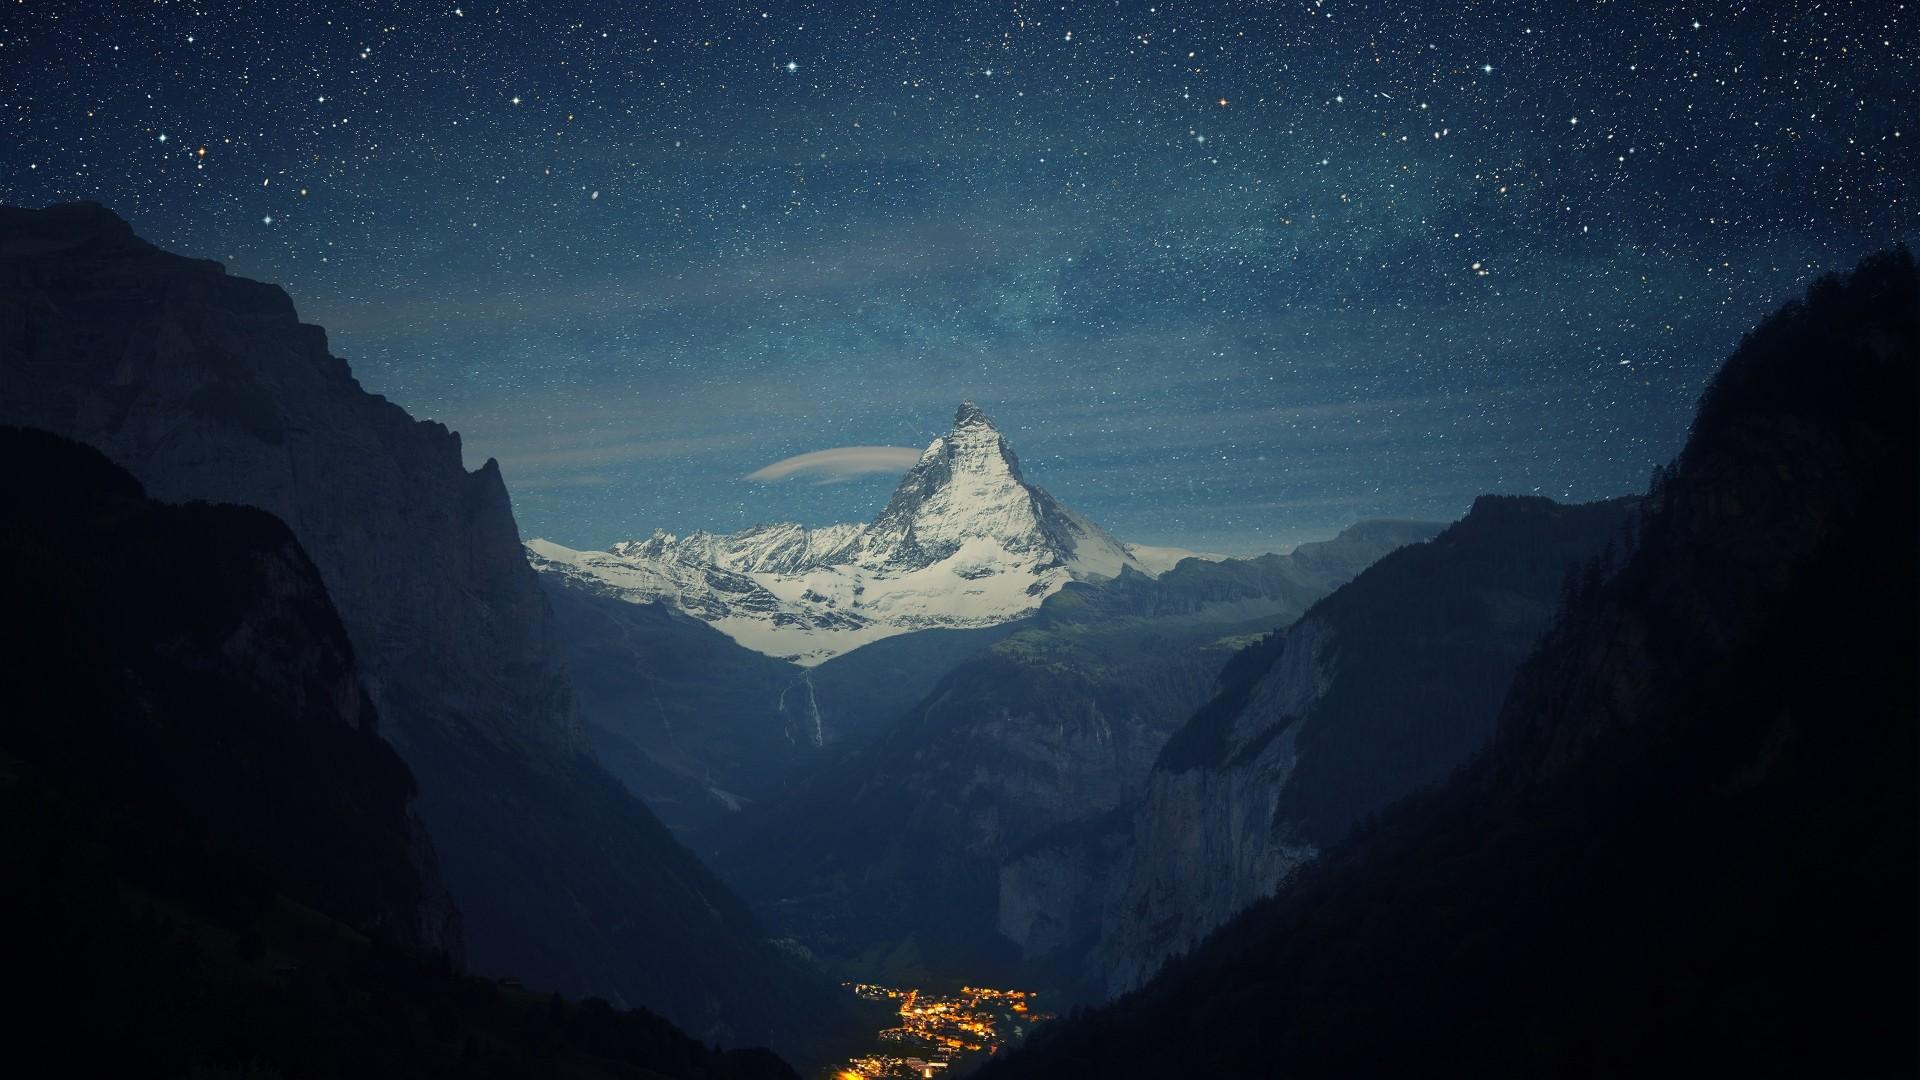 Preview wallpaper switzerland, alps, mountains, night, beautiful landscape  1920×1080